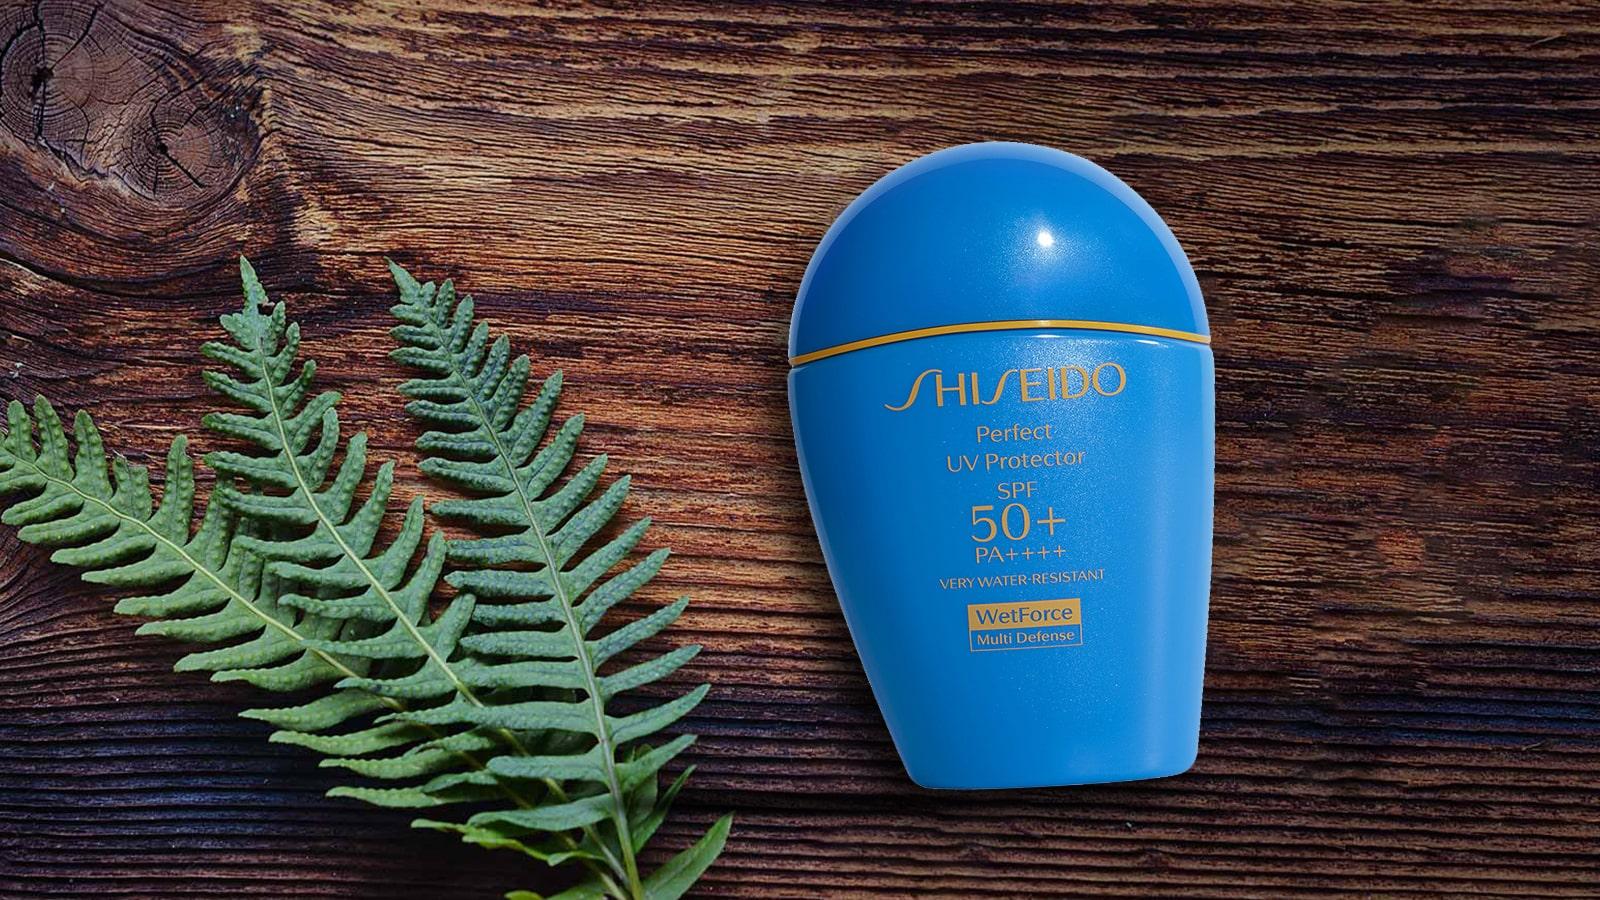 Shiseido Perfect UV Protector Multi Defense